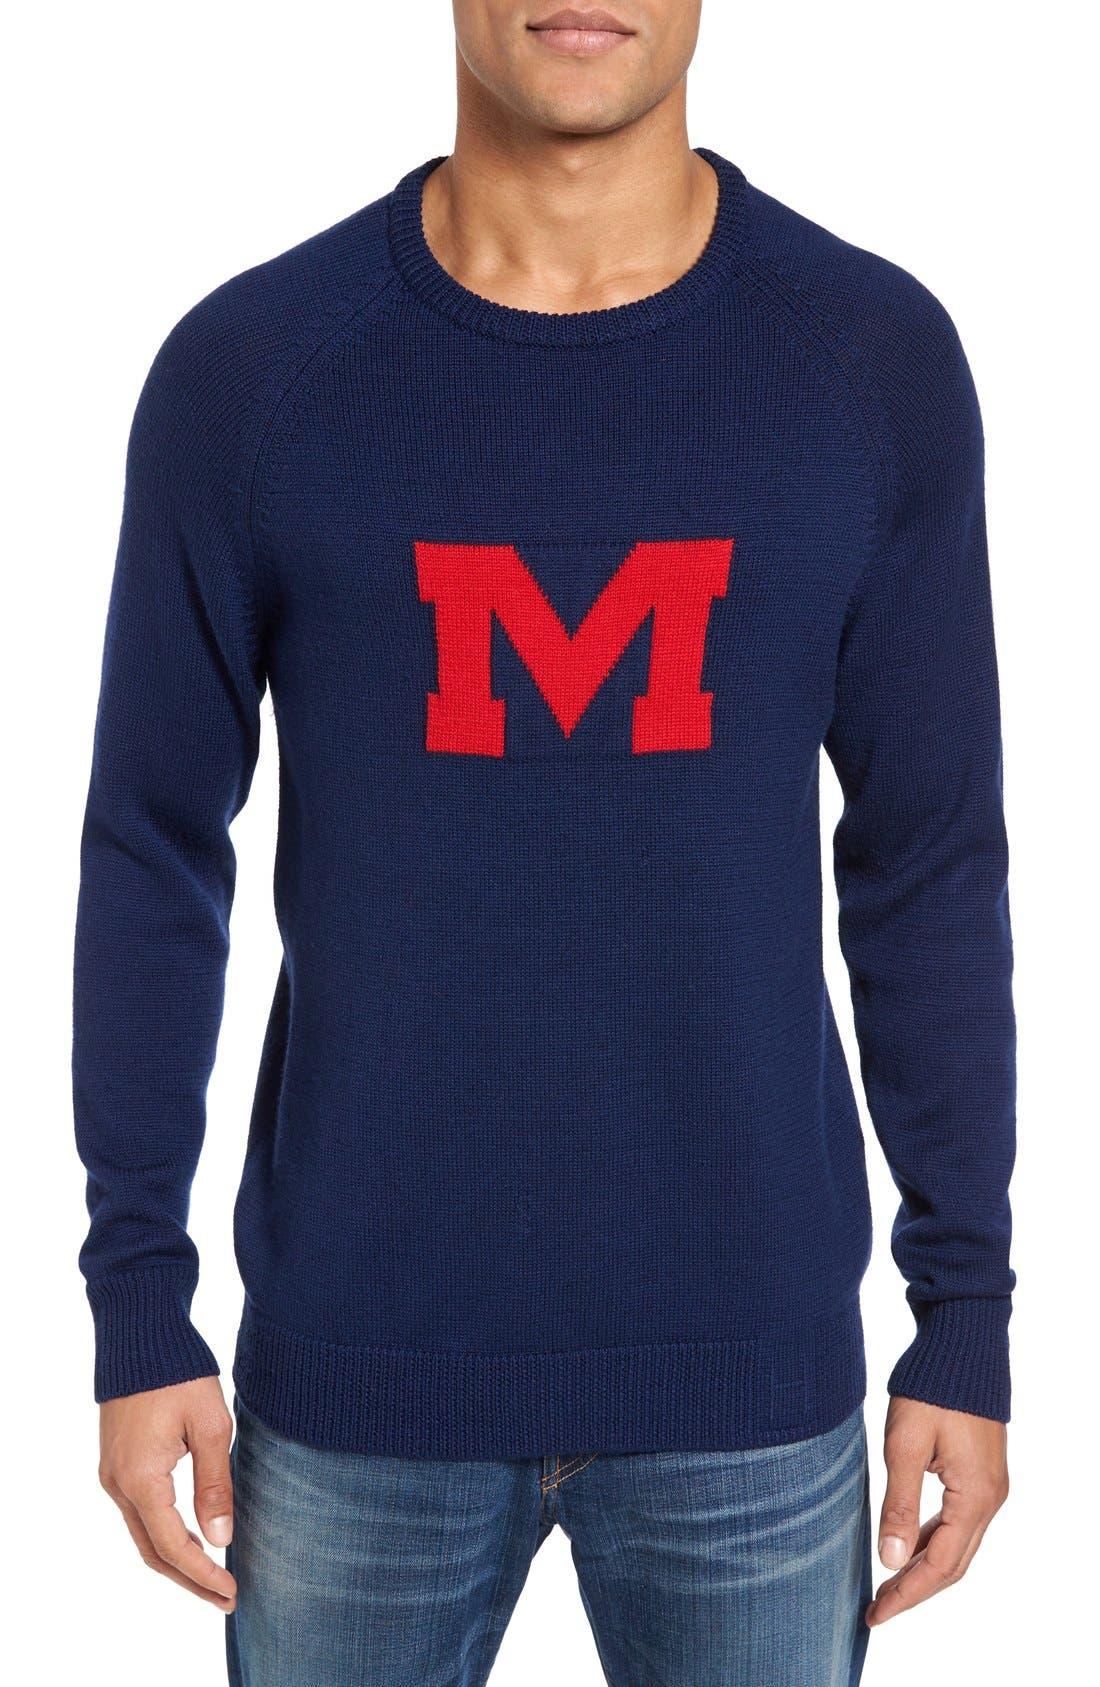 Main Image - Hillflint Ole Miss Heritage Sweater